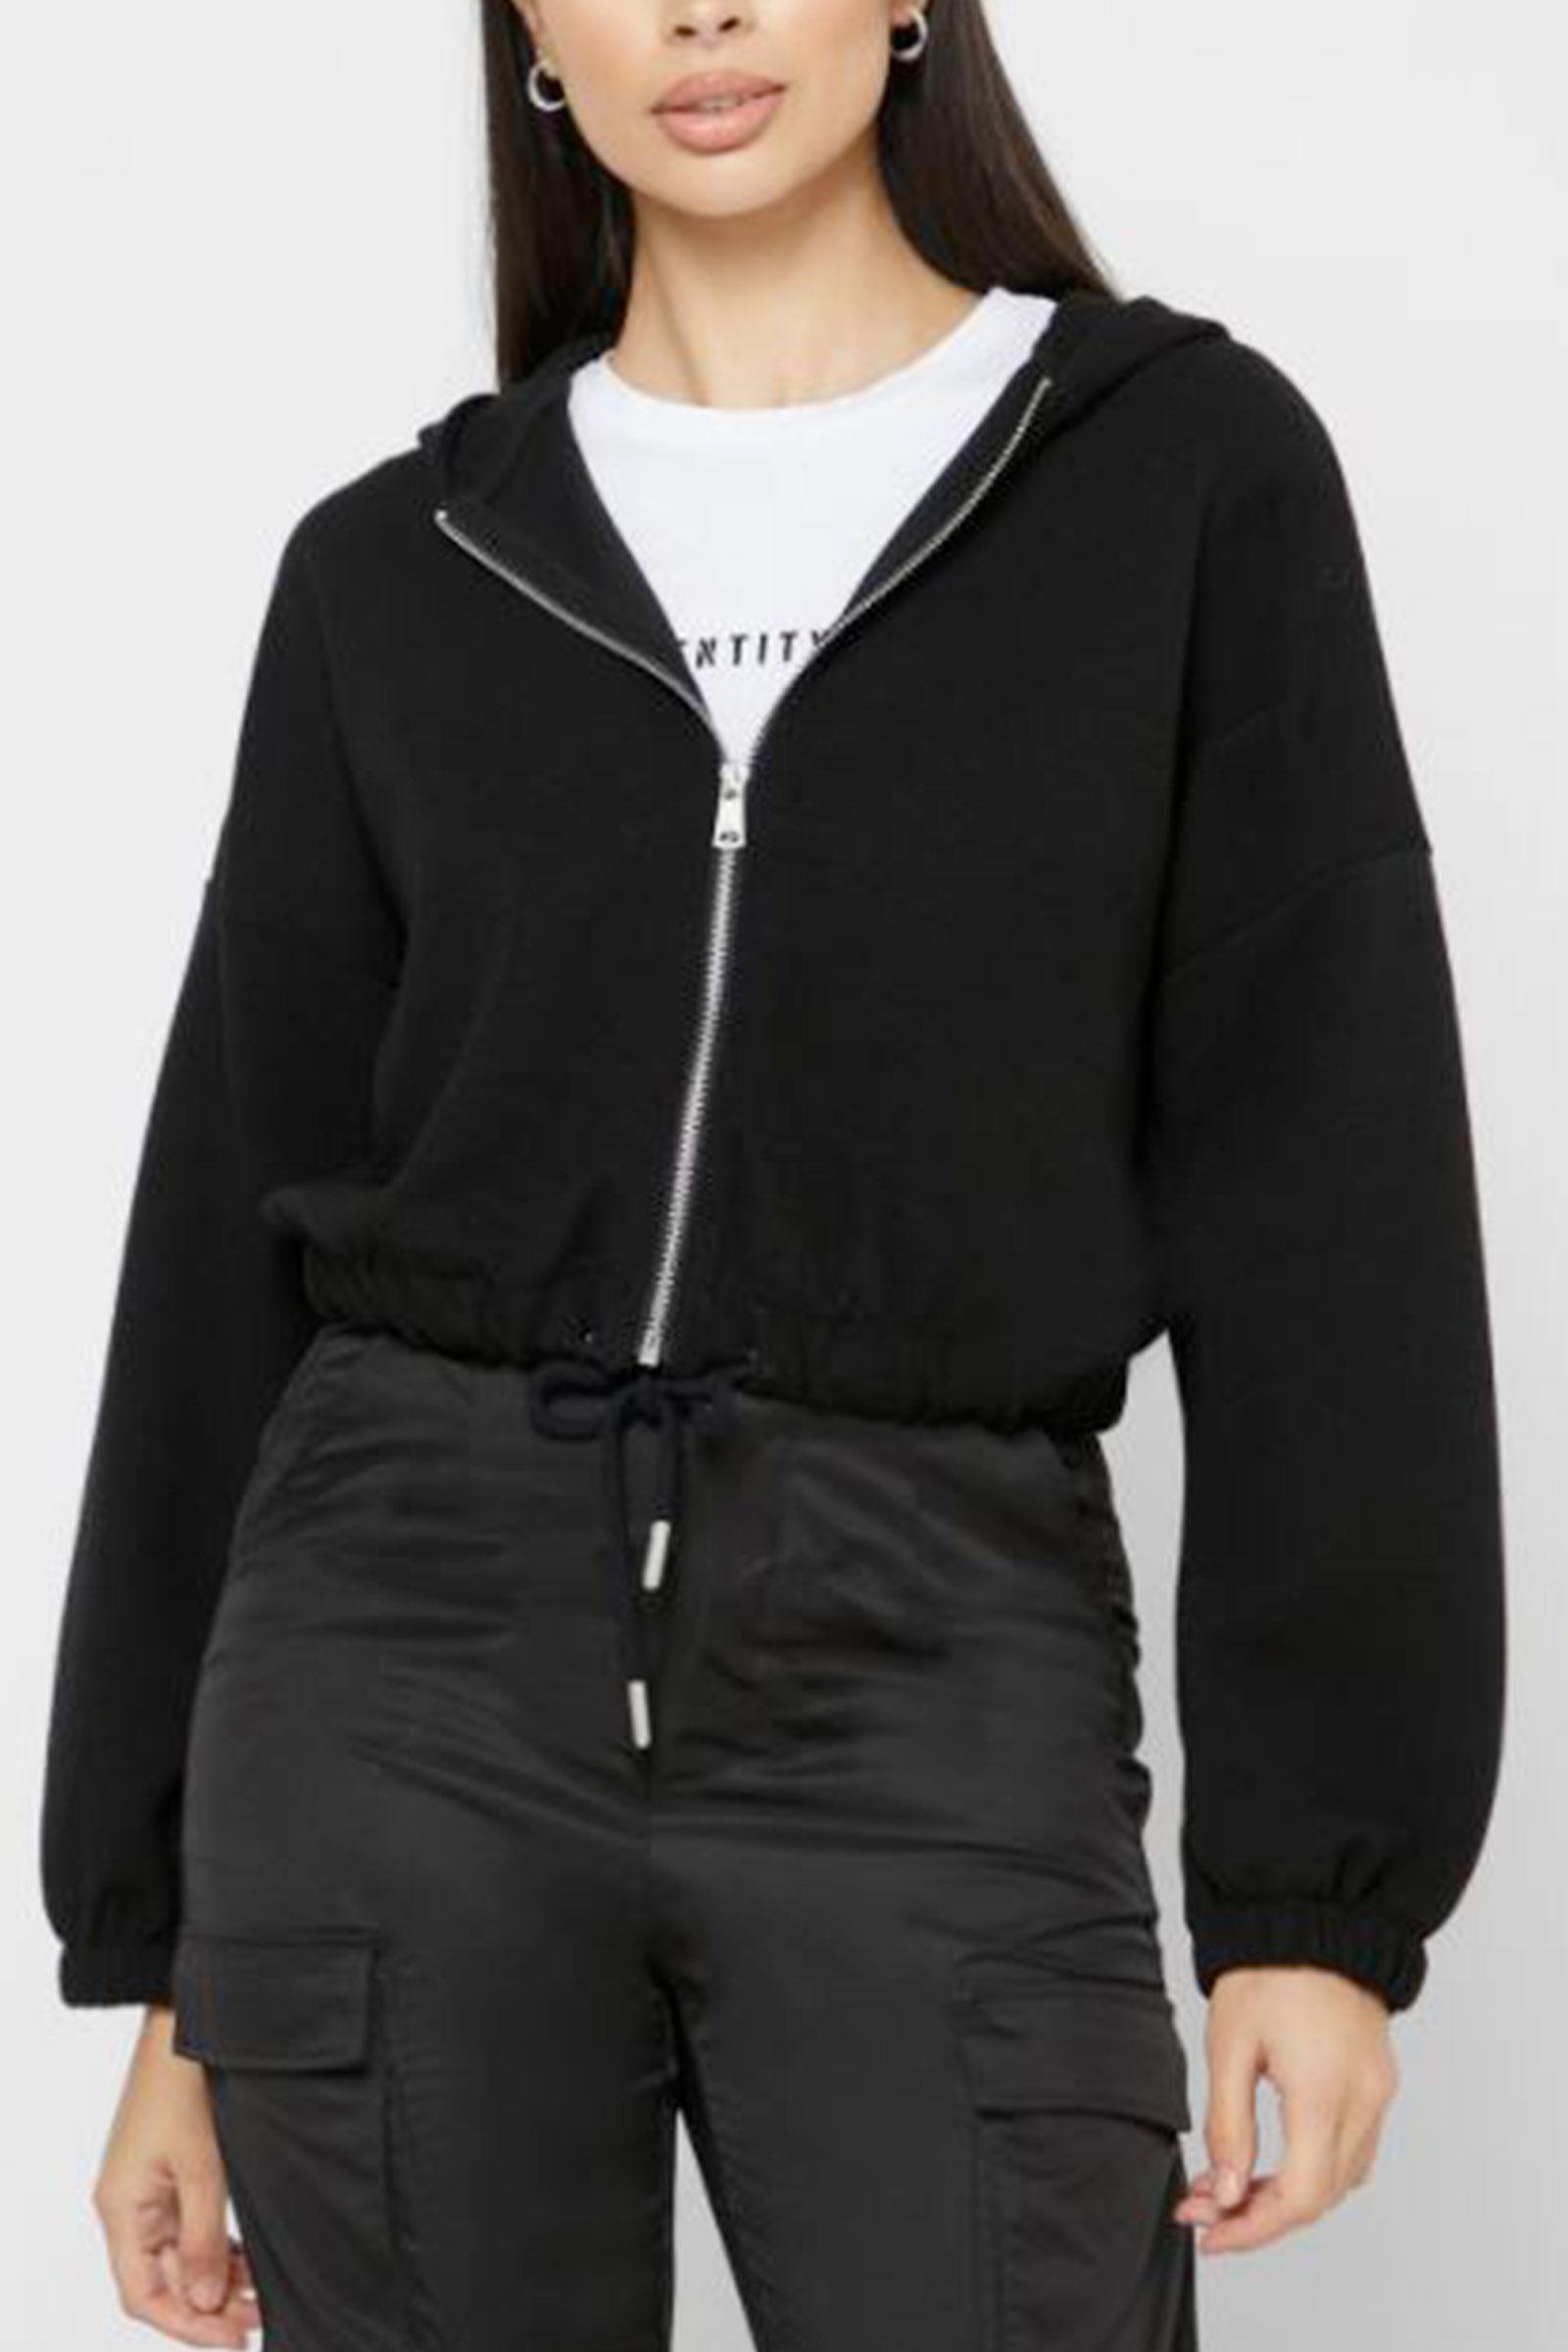 ONLY Women's Sweatshirt ONLY   Sweatshirt   15210679Black